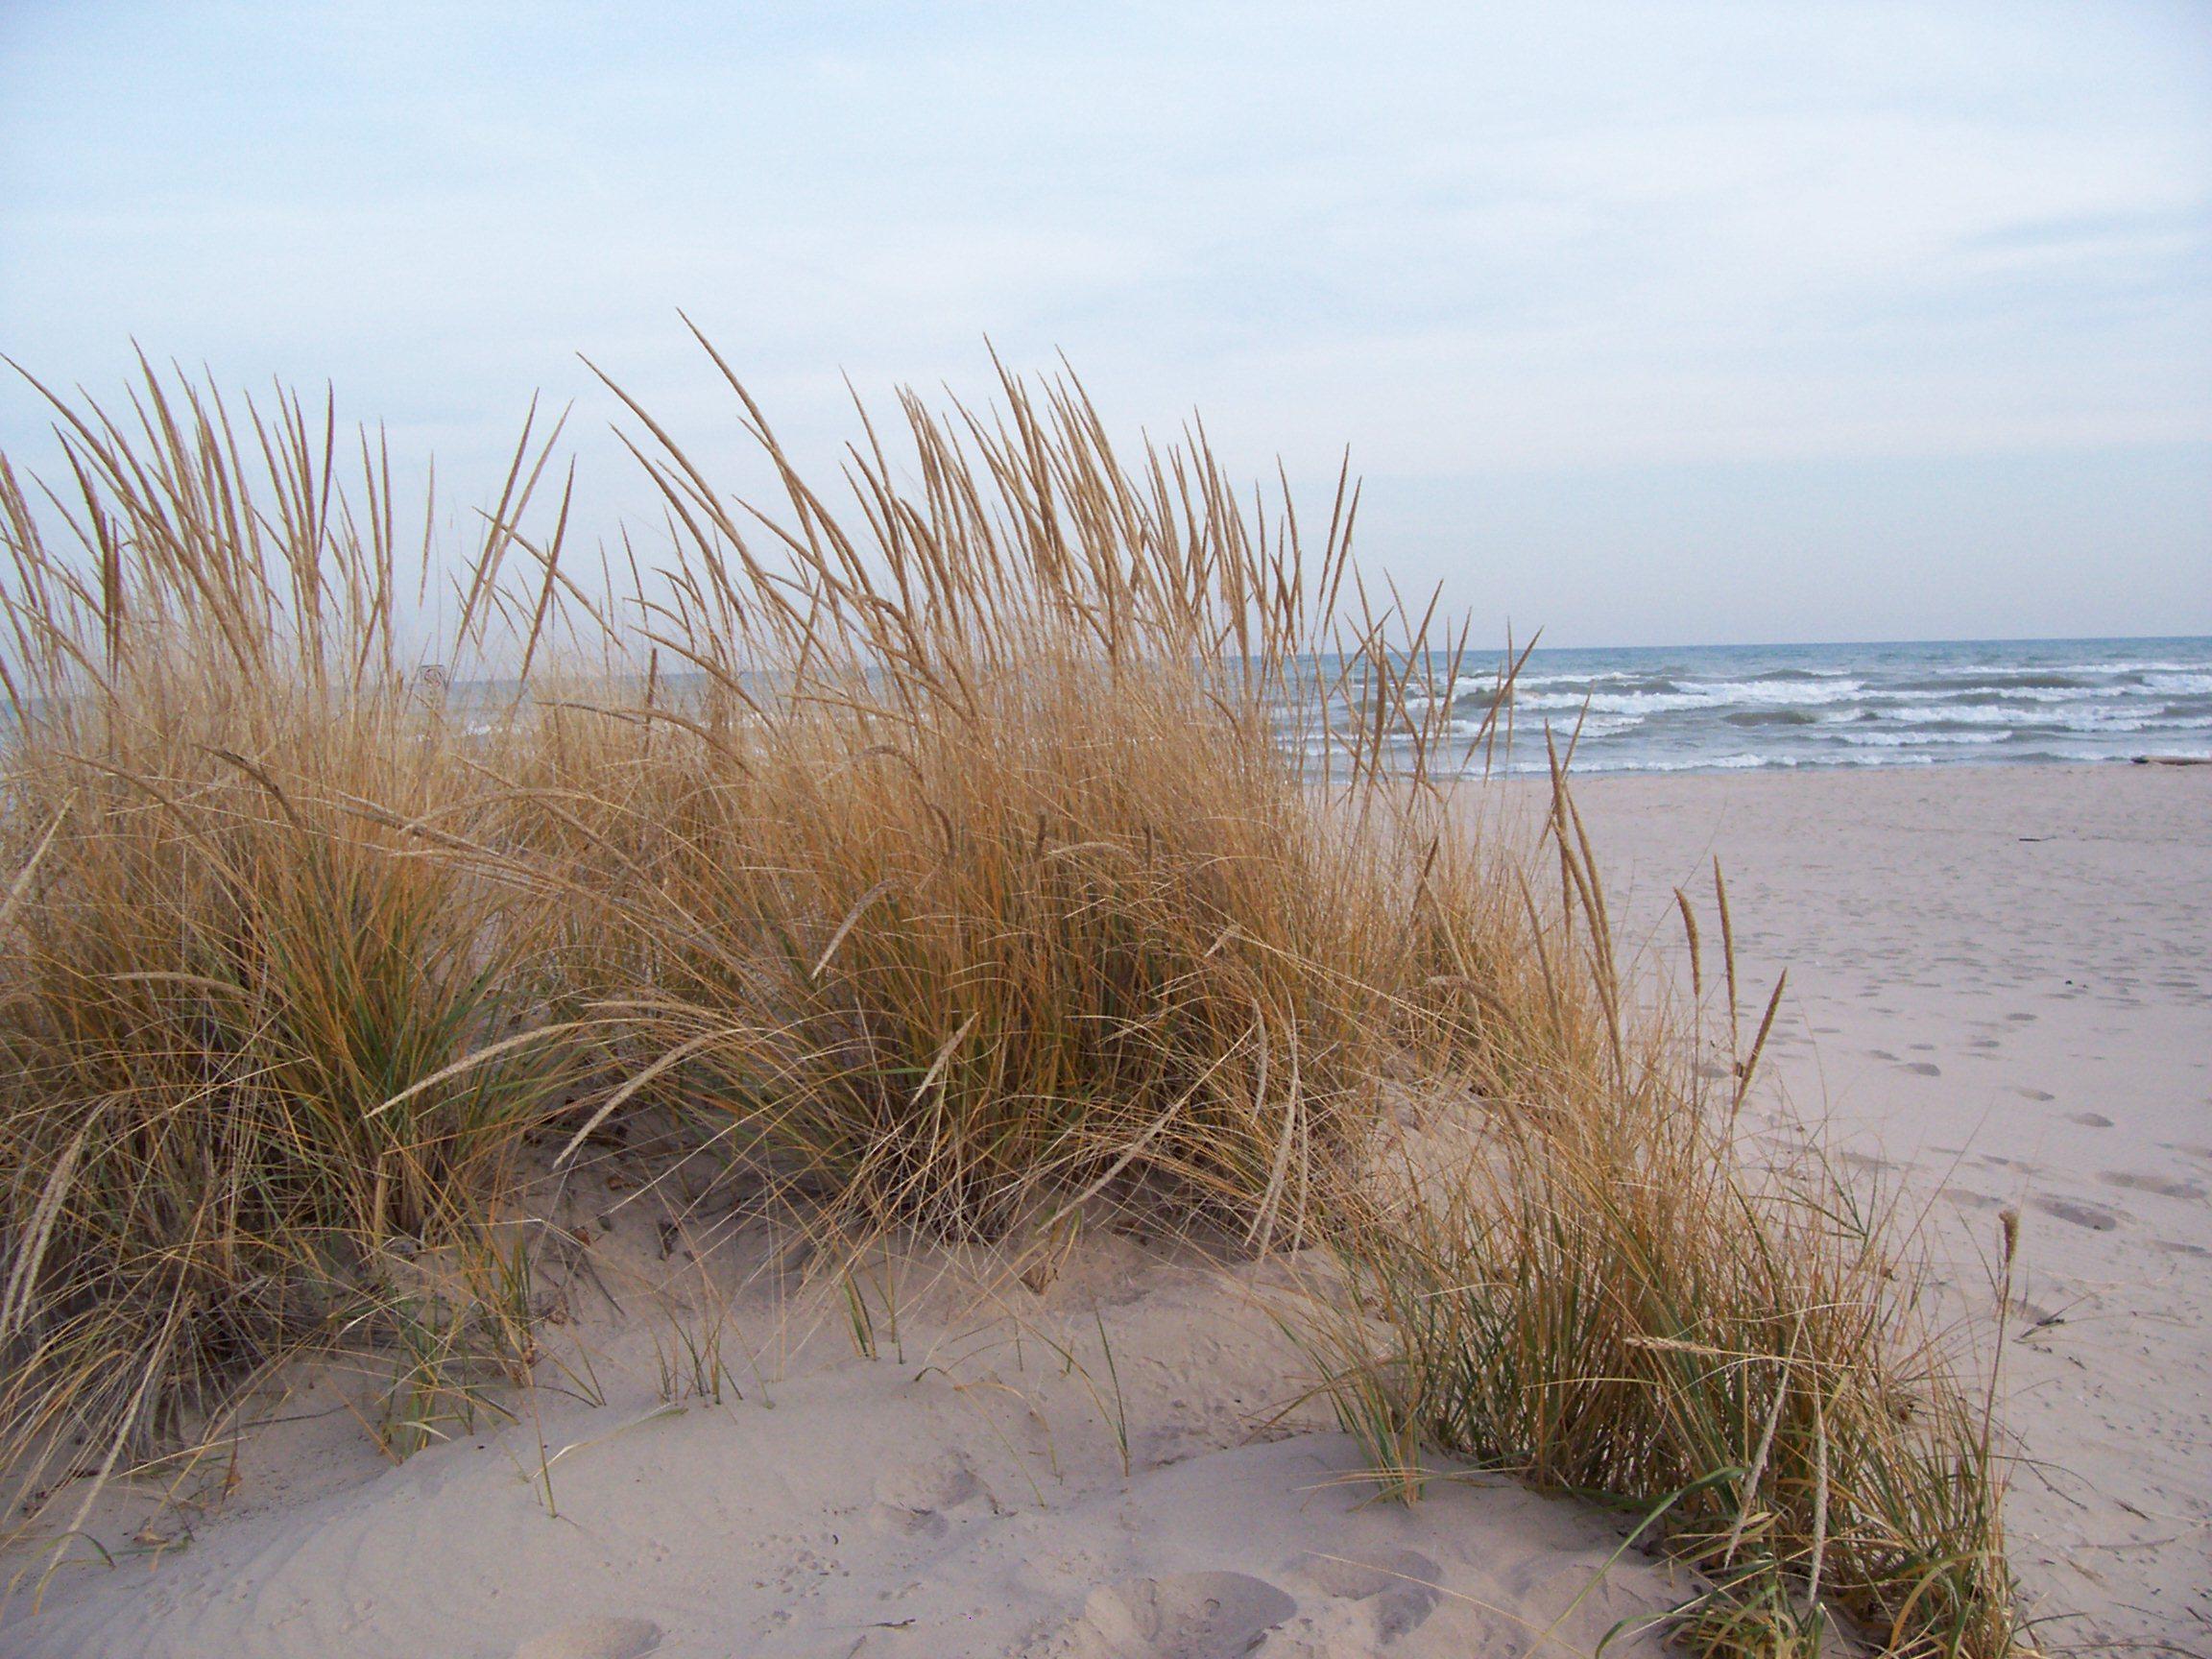 Beach grass photo